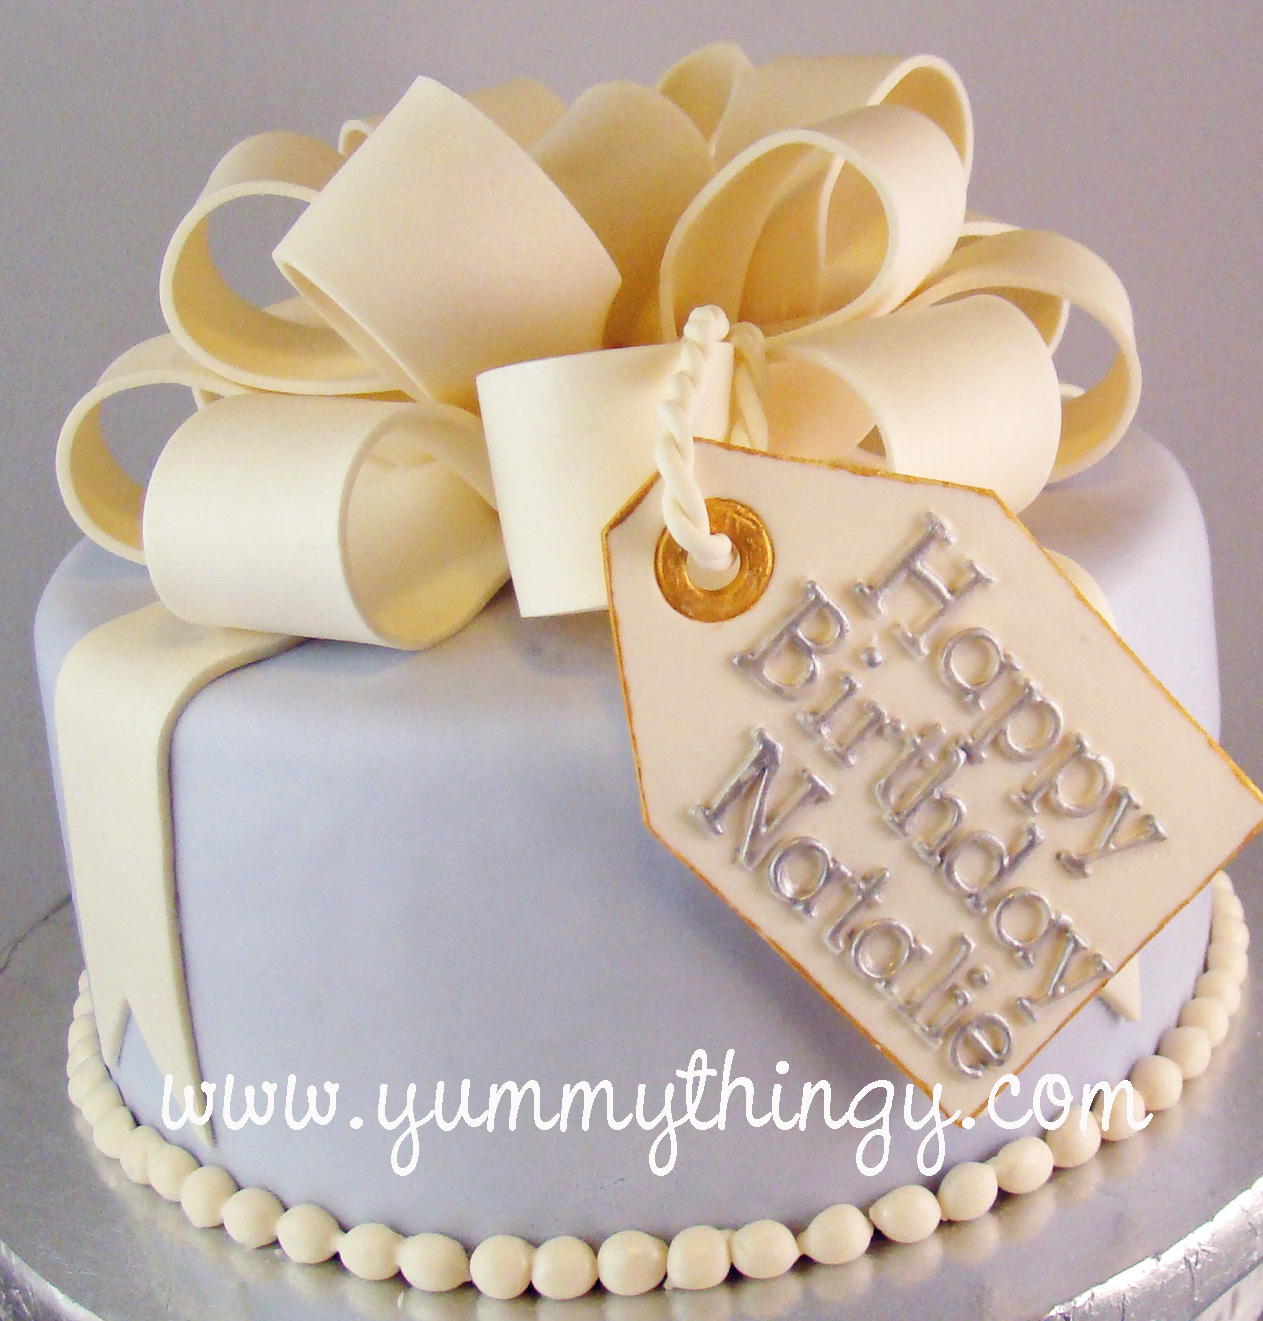 Yummy Thingy Natalies Present Cake